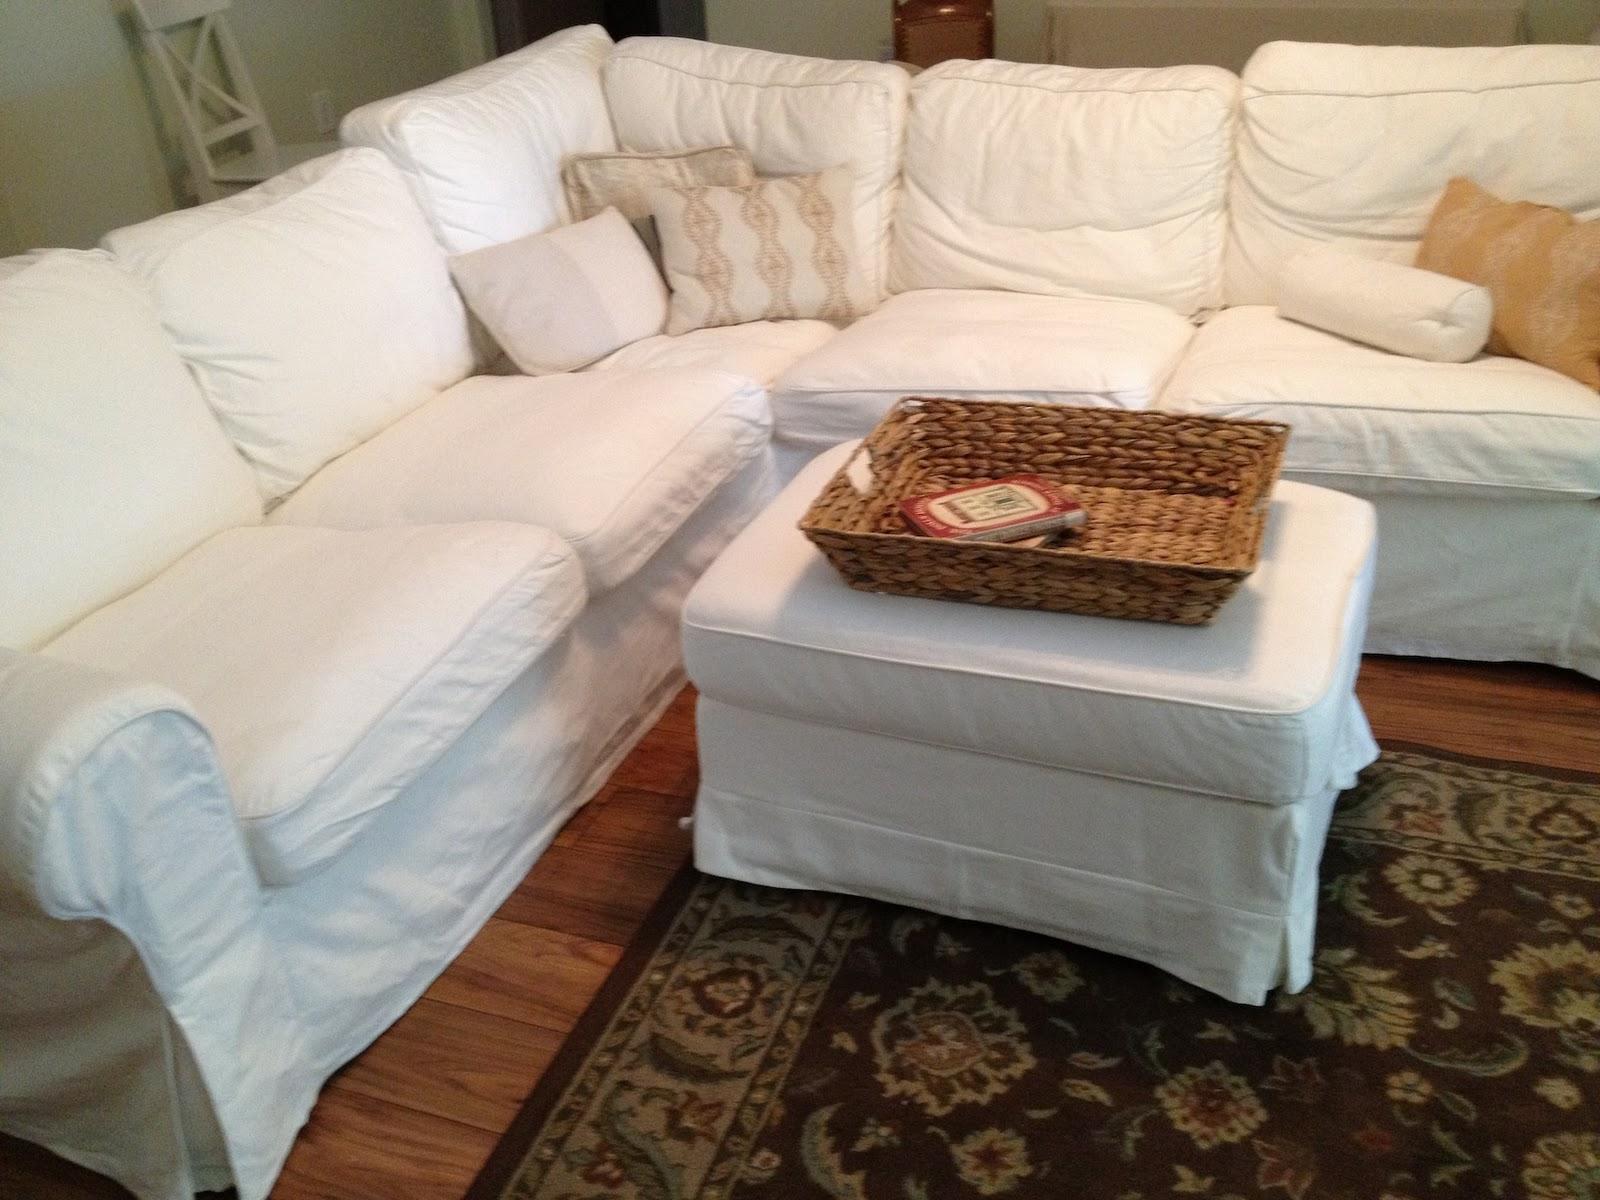 titus 2 work in progress ikea ektorp sofa review part 2 follow up. Black Bedroom Furniture Sets. Home Design Ideas